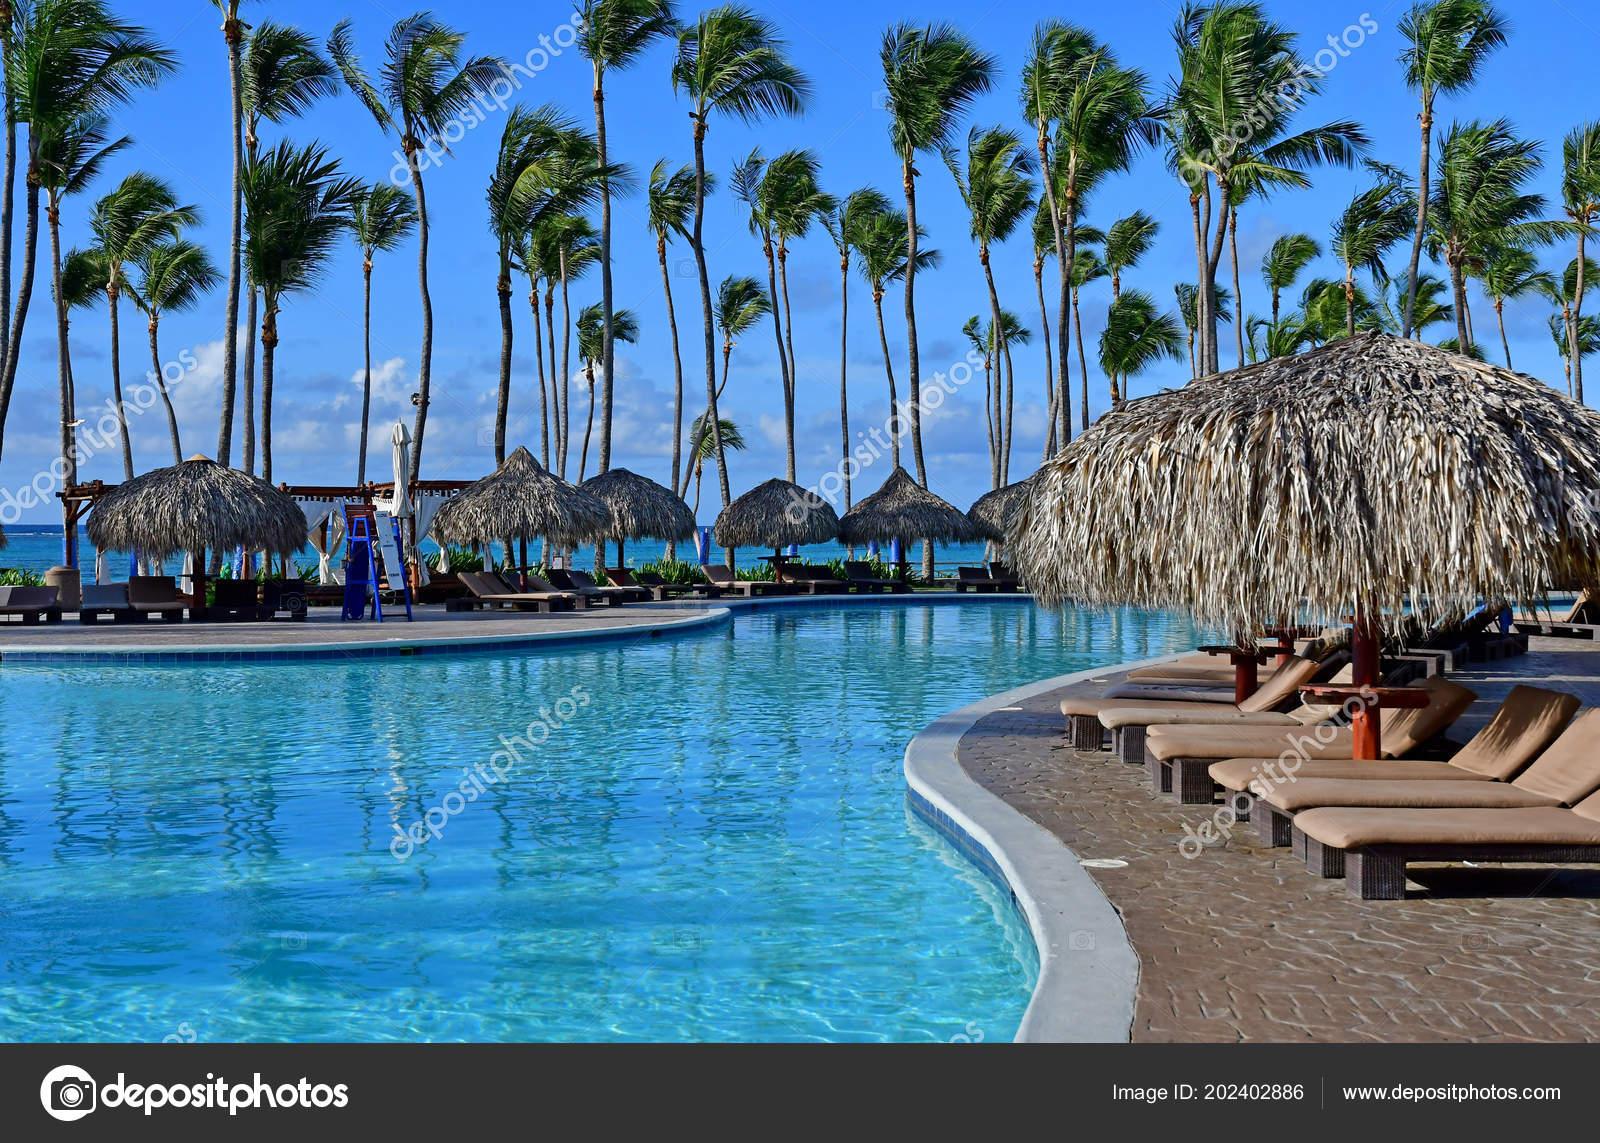 punta cana dominican republic may 2017 pool hotel stock editorial